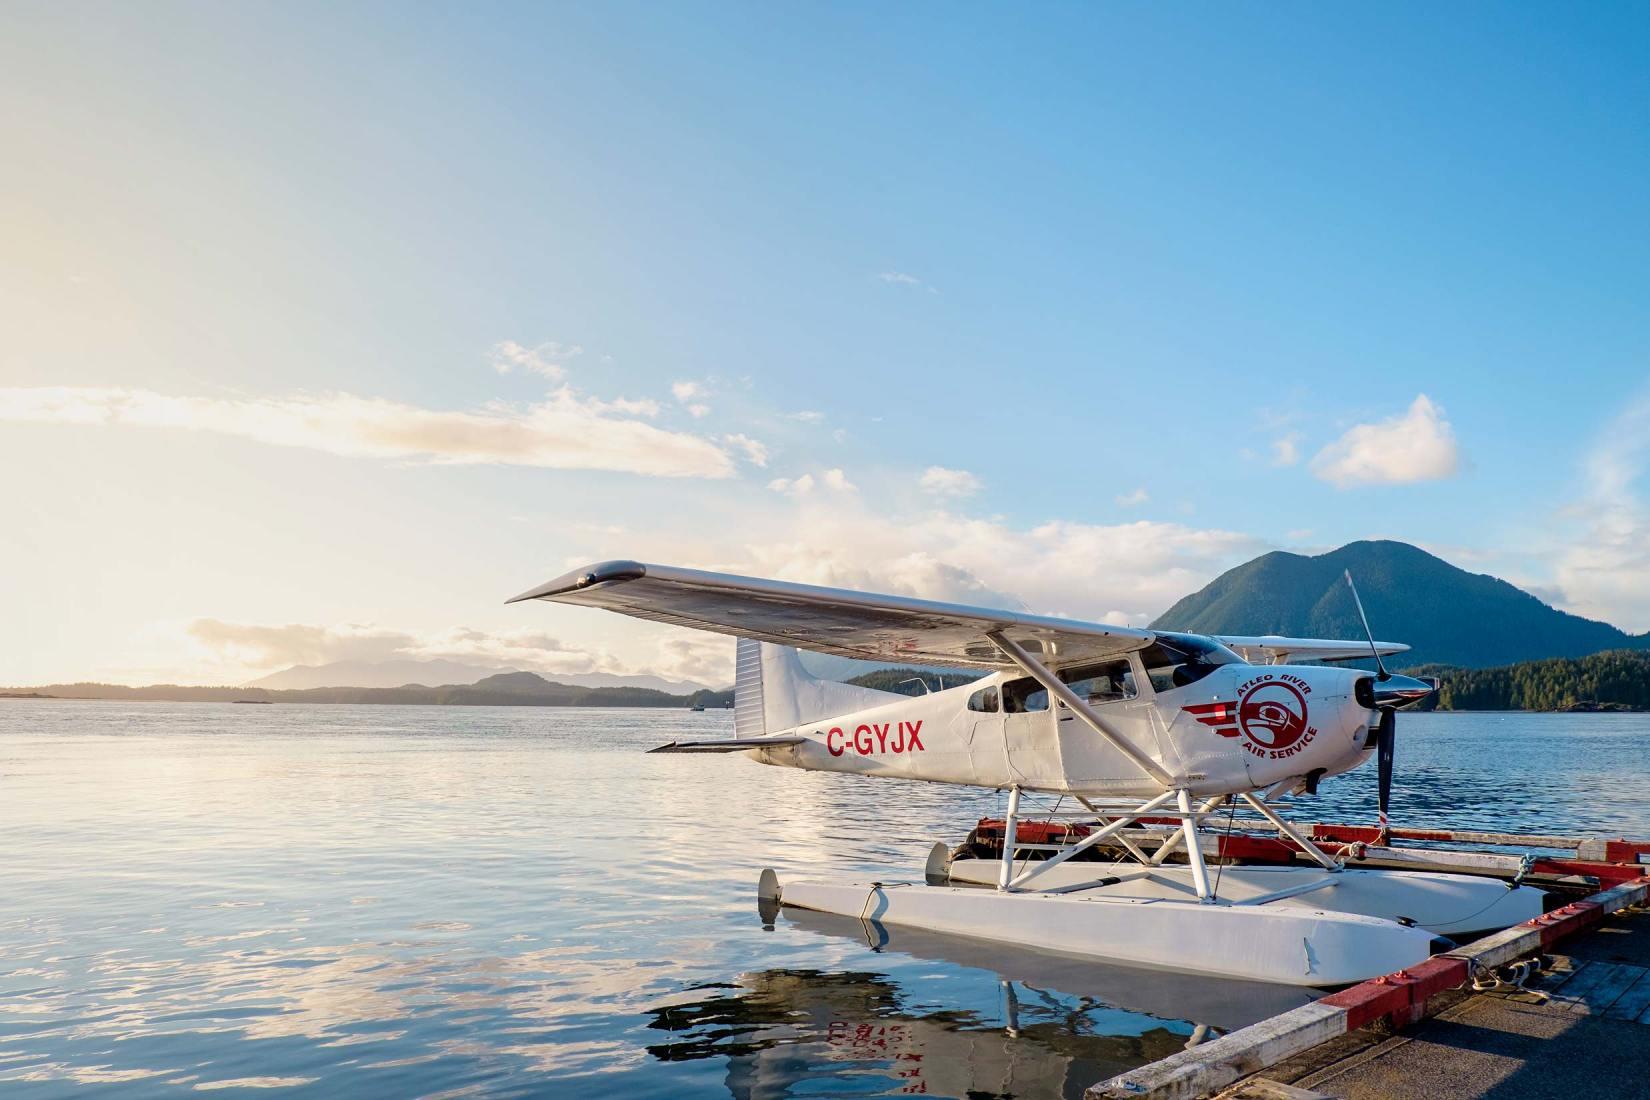 PWS015-0394-Sharon-Blance-photographer-Tofino-travel-editorial-float-sea-plane